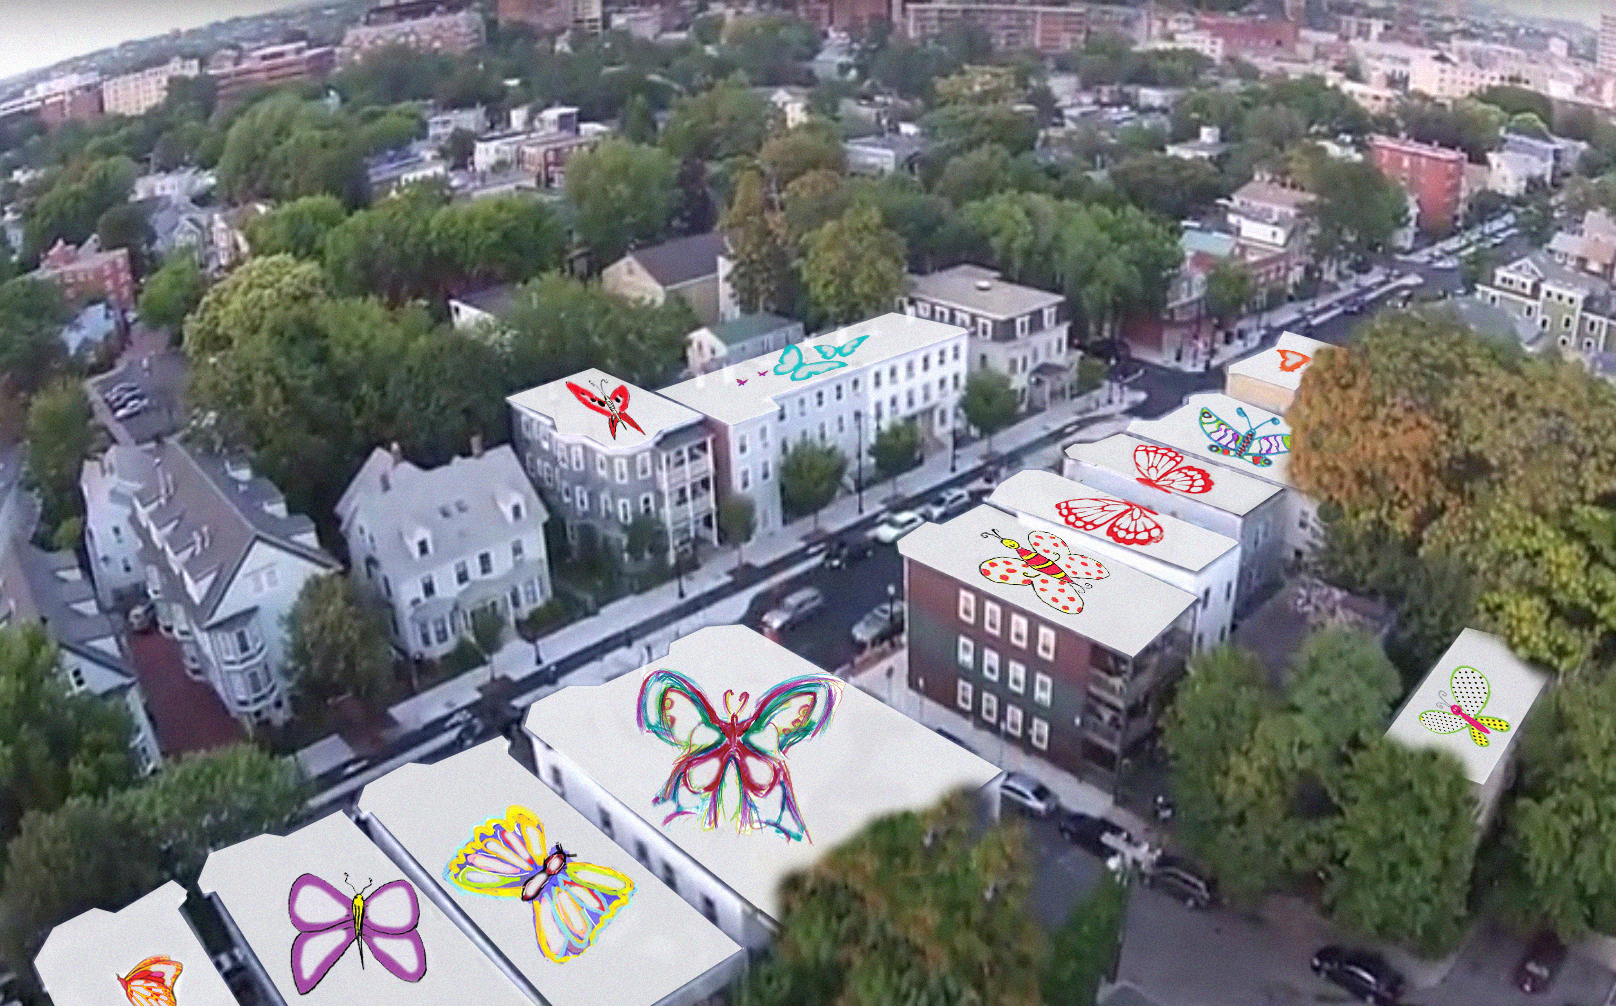 Drone rooftops noise copy.jpg